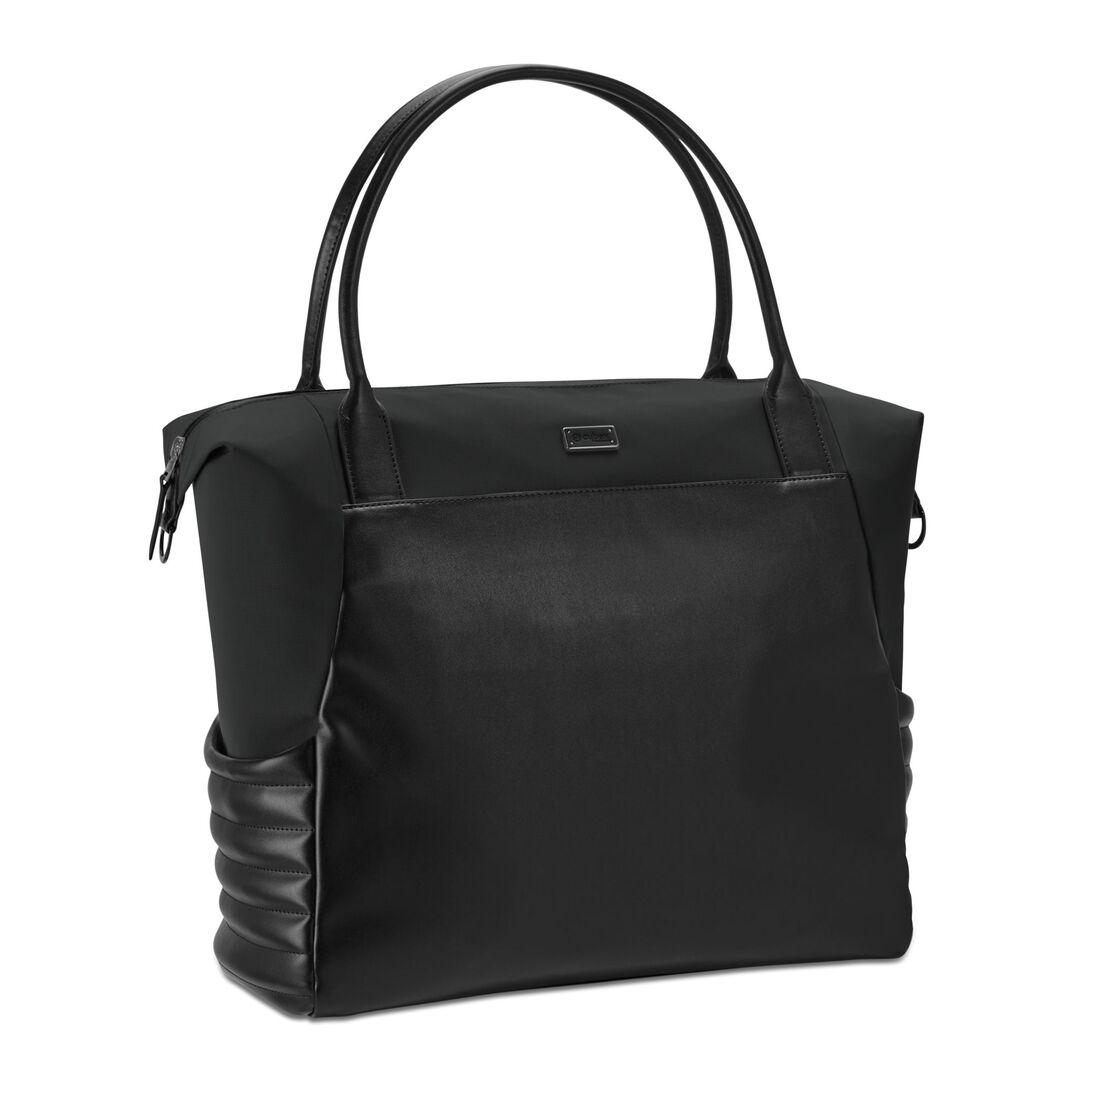 CYBEX Priam Changing Bag - Deep Black in Deep Black large Bild 2